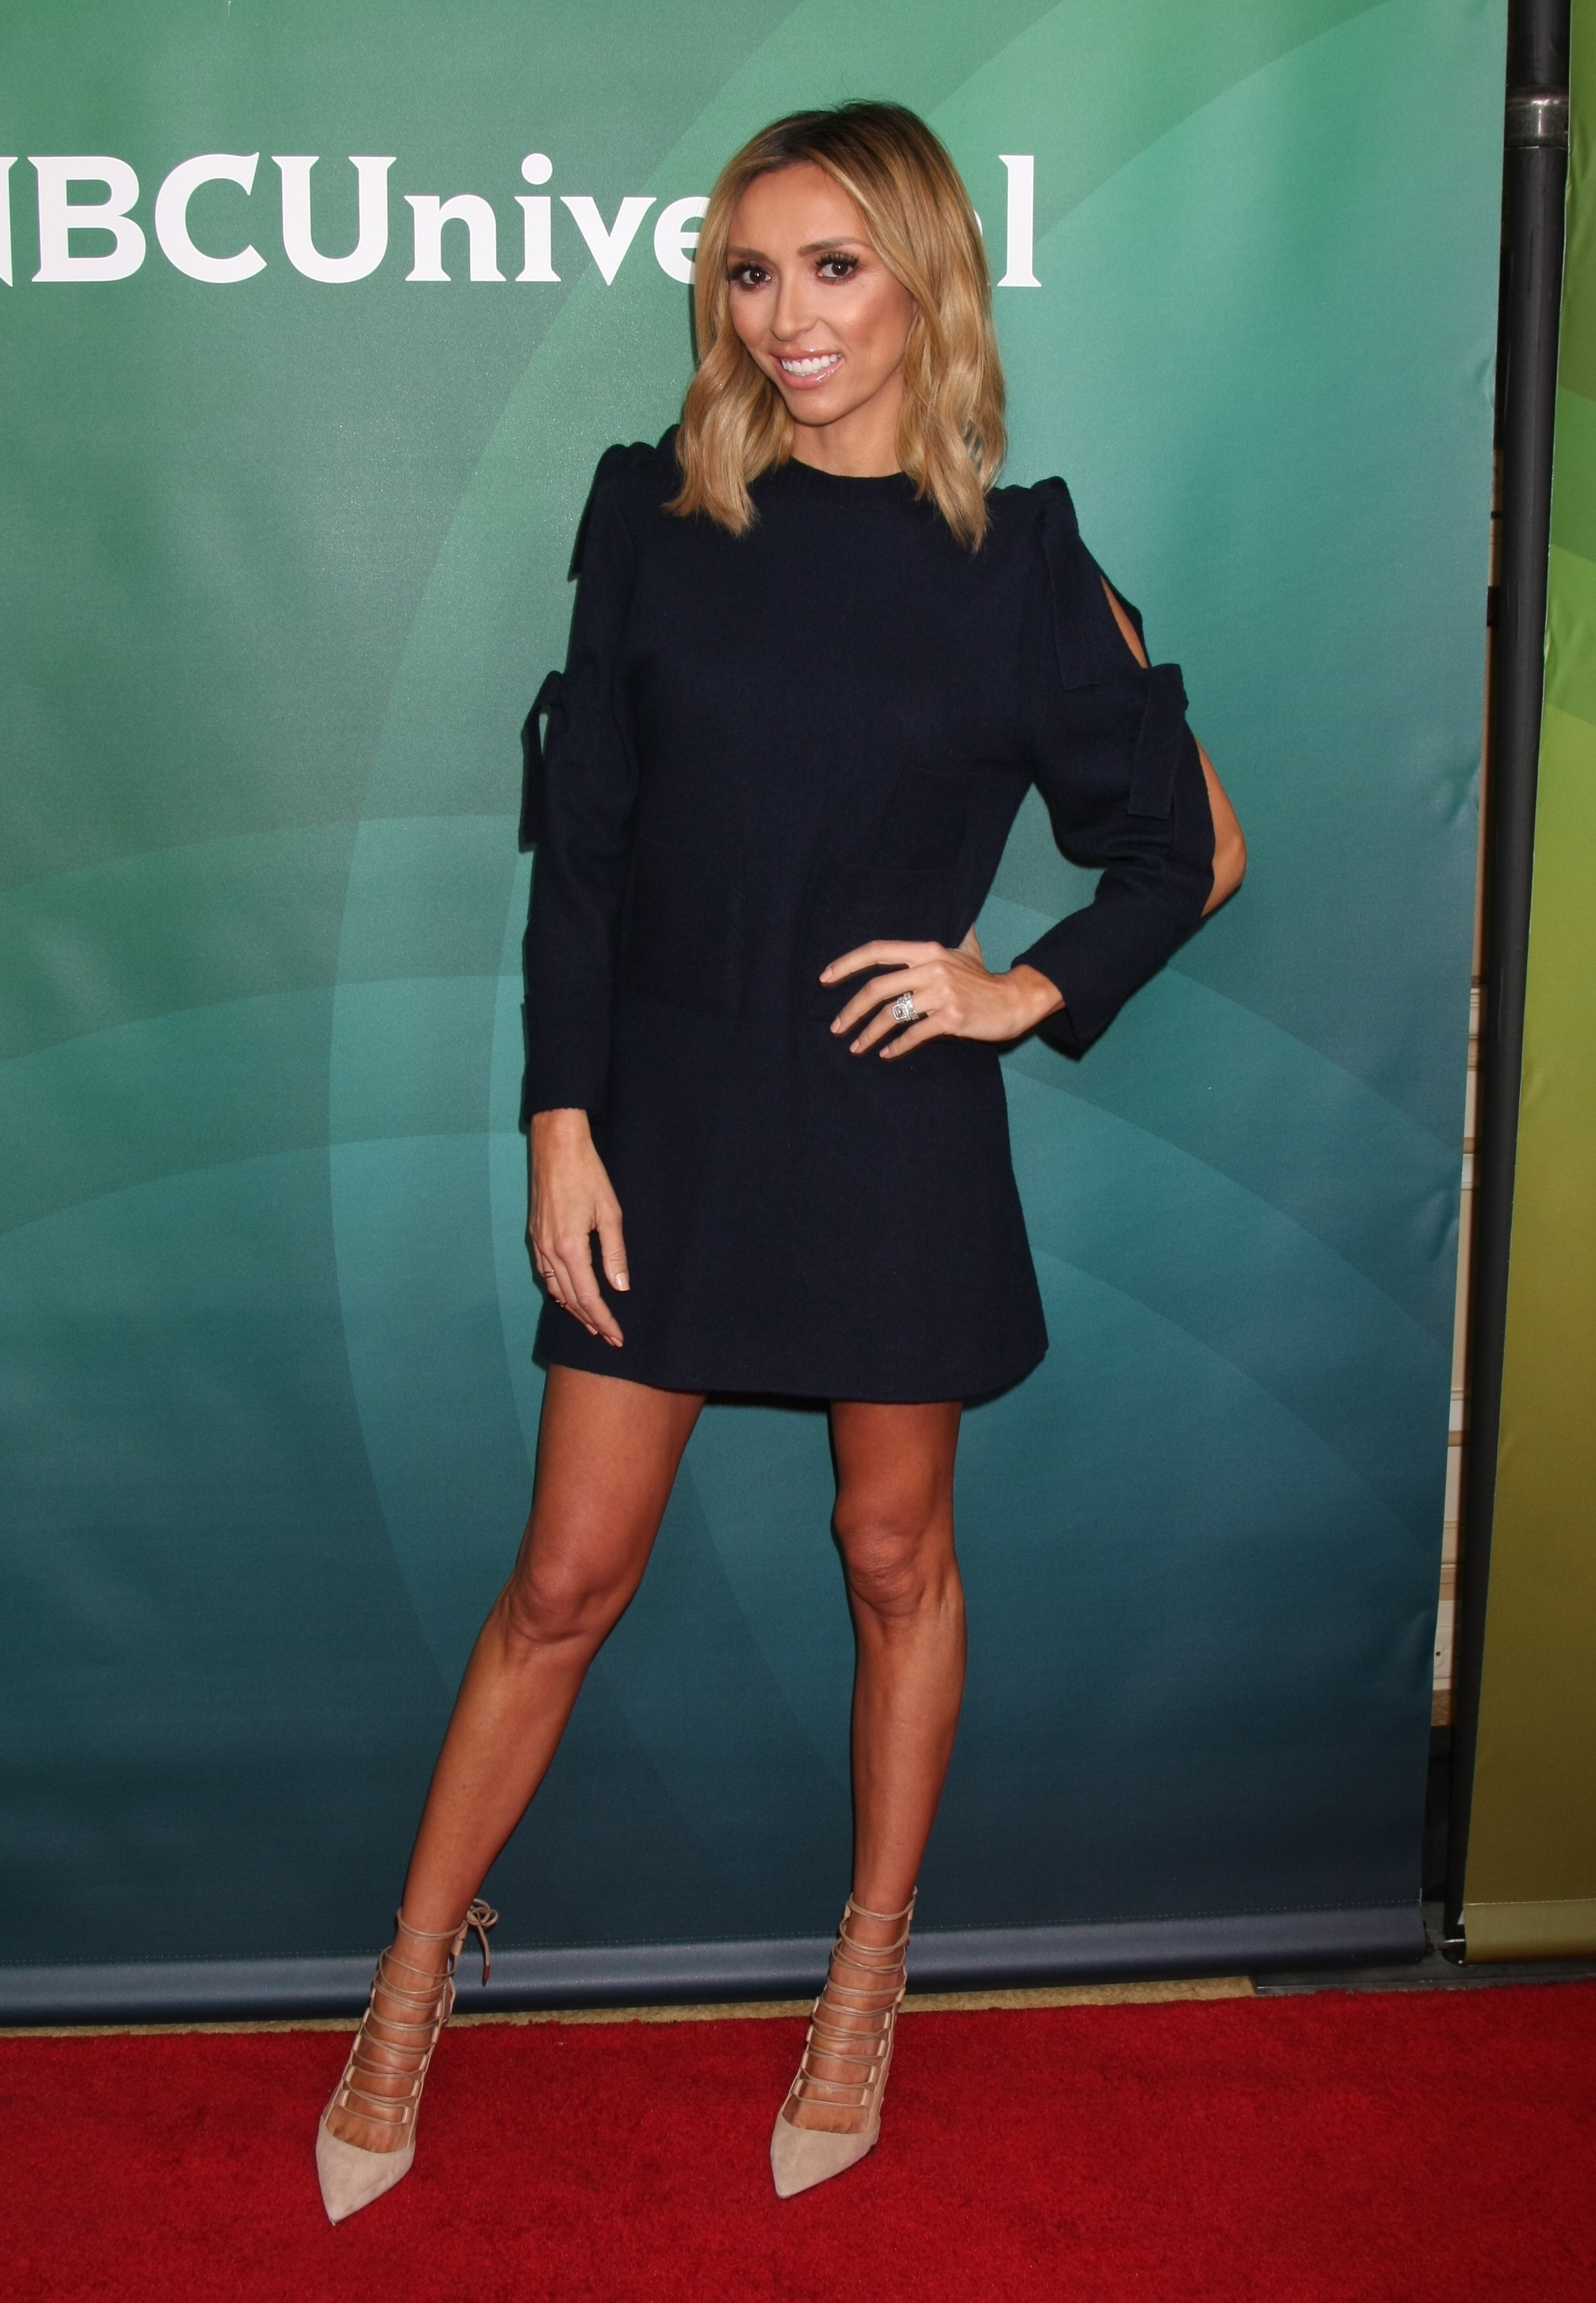 Giuliana Rancic showcases her tight, toned legs